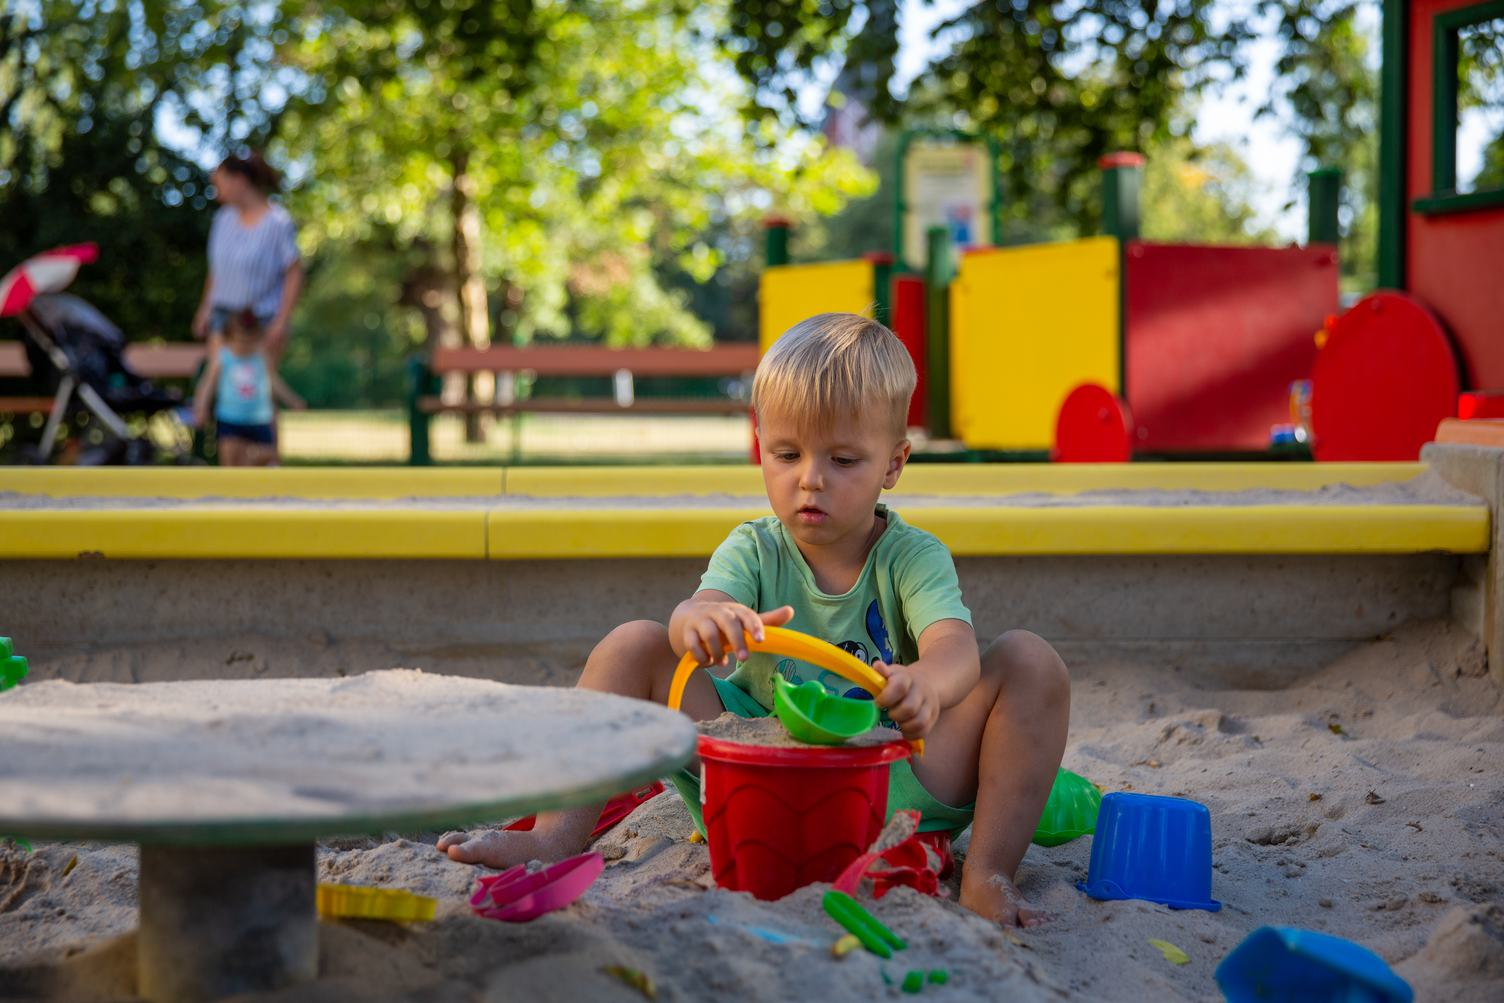 Cute Little Boy in the Sandbox